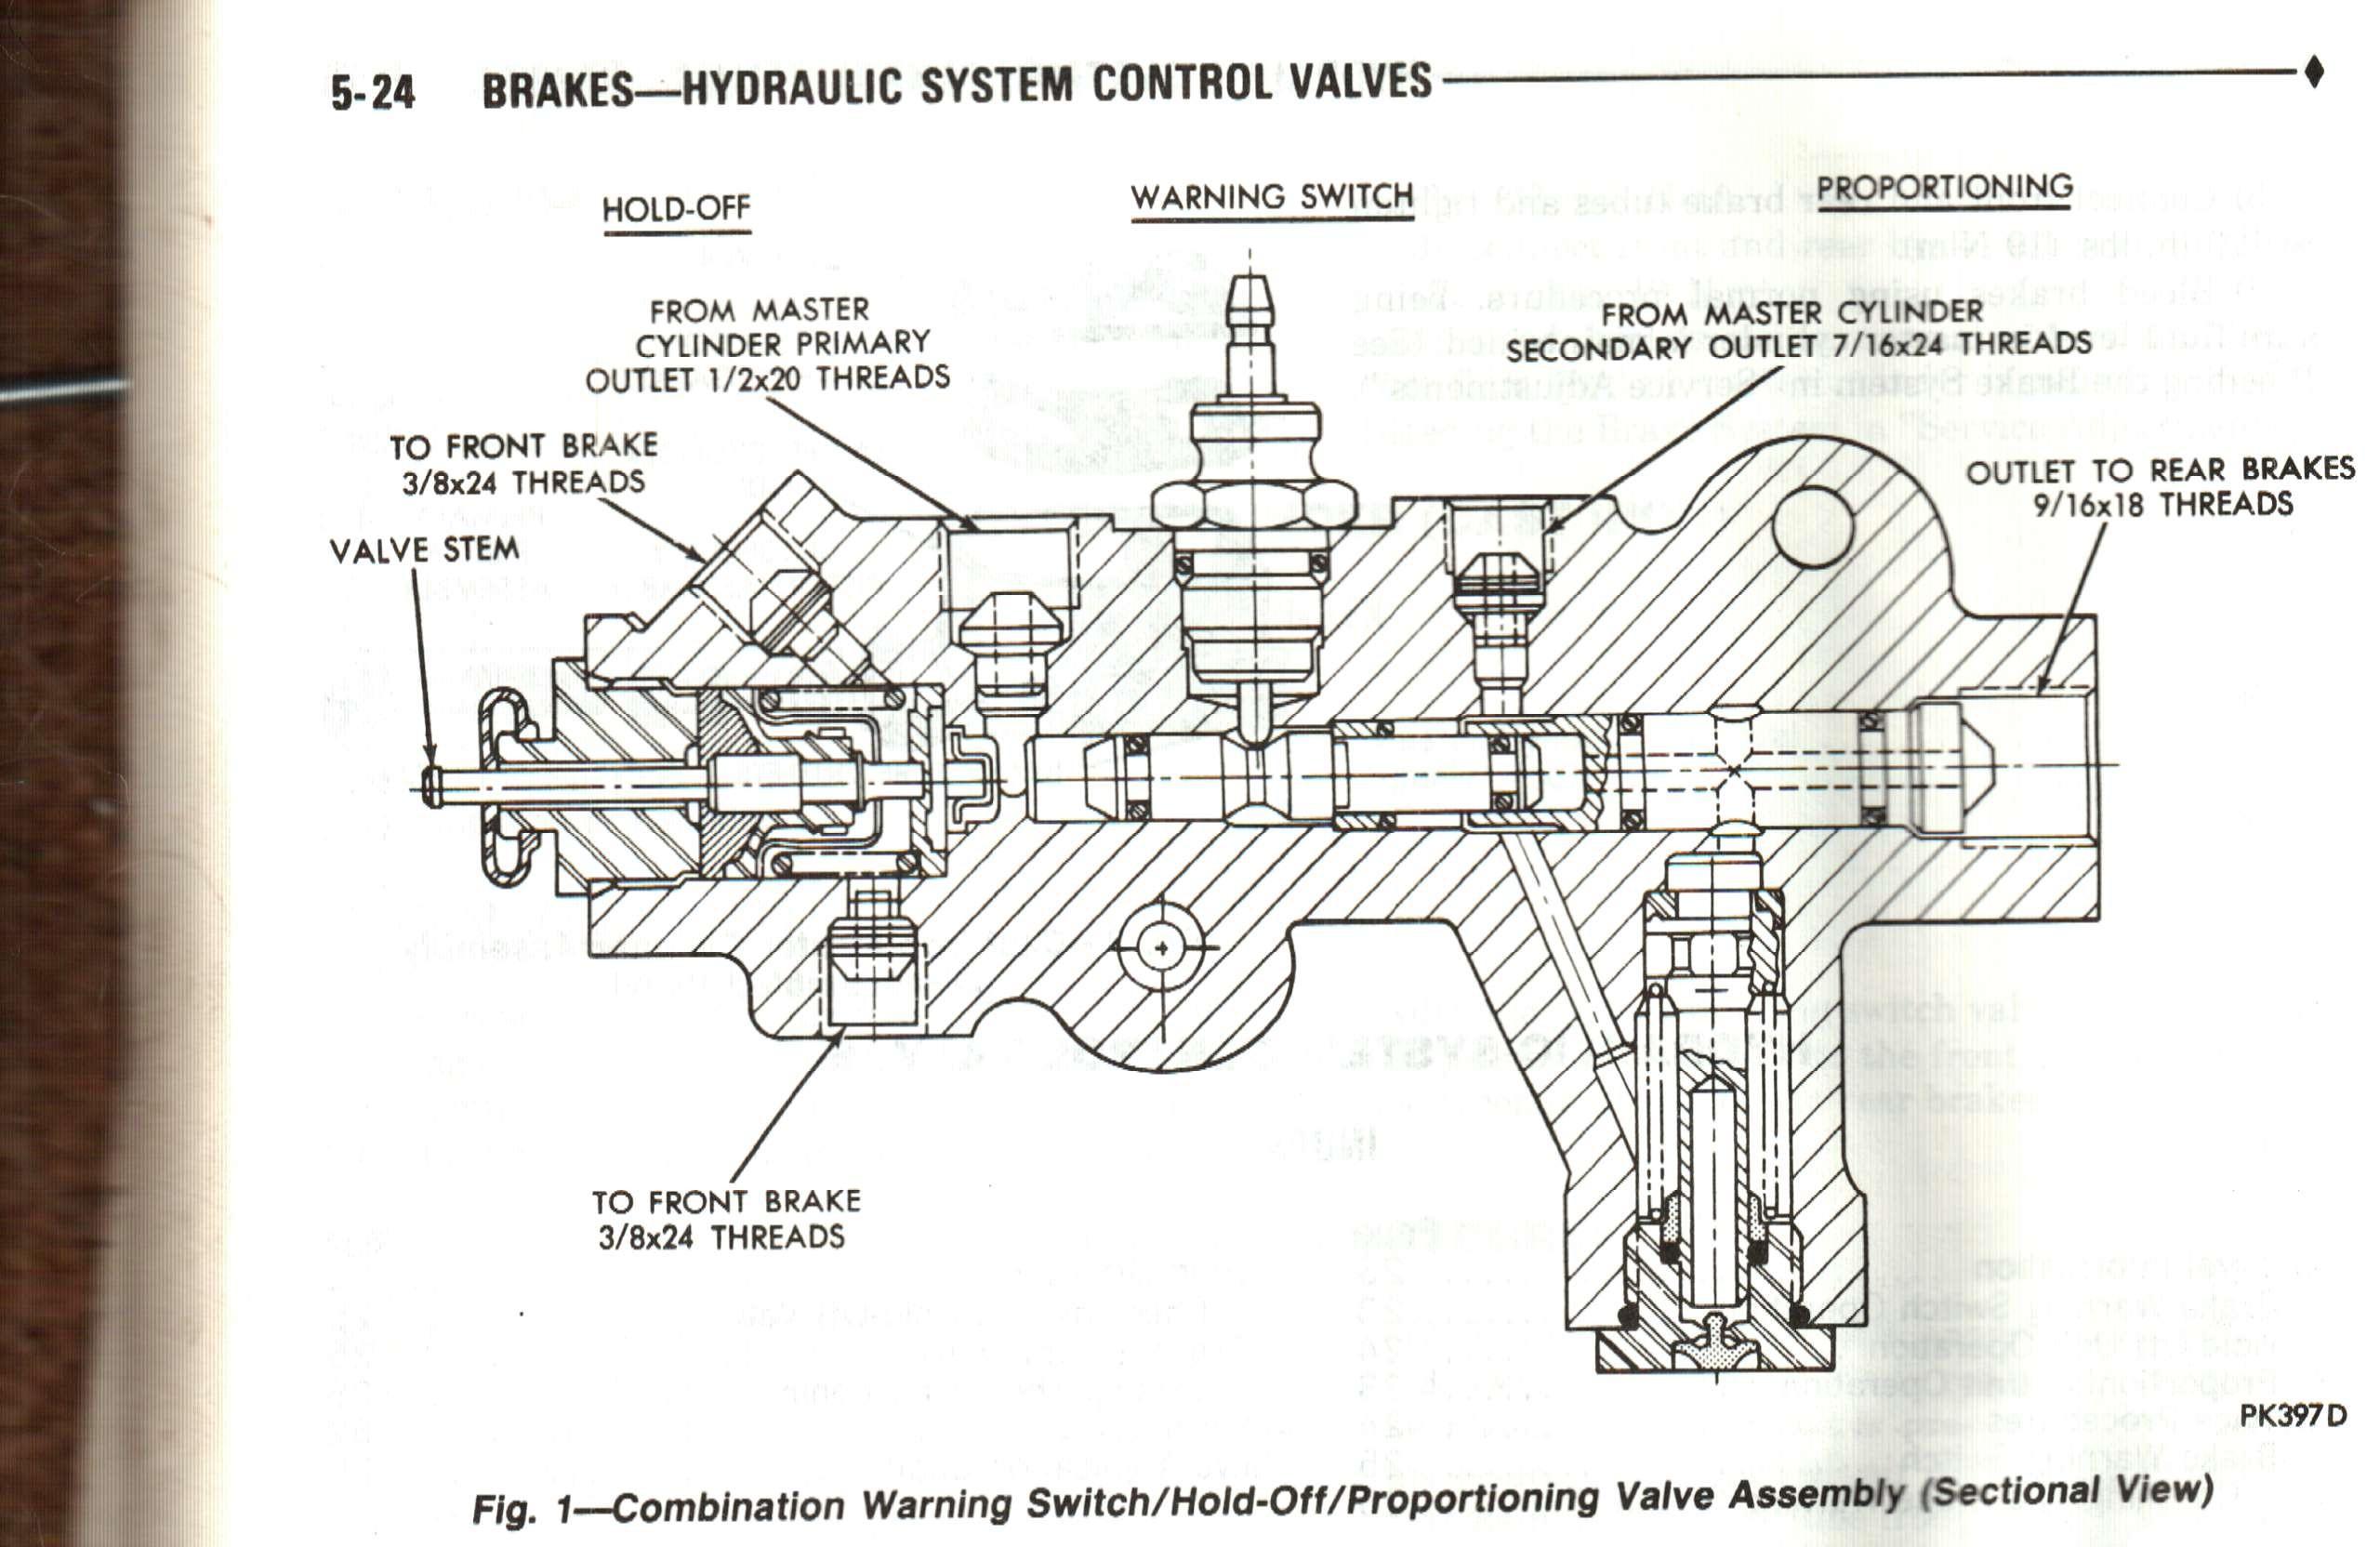 Proportioning Valve Diagram | My Wiring DIagram